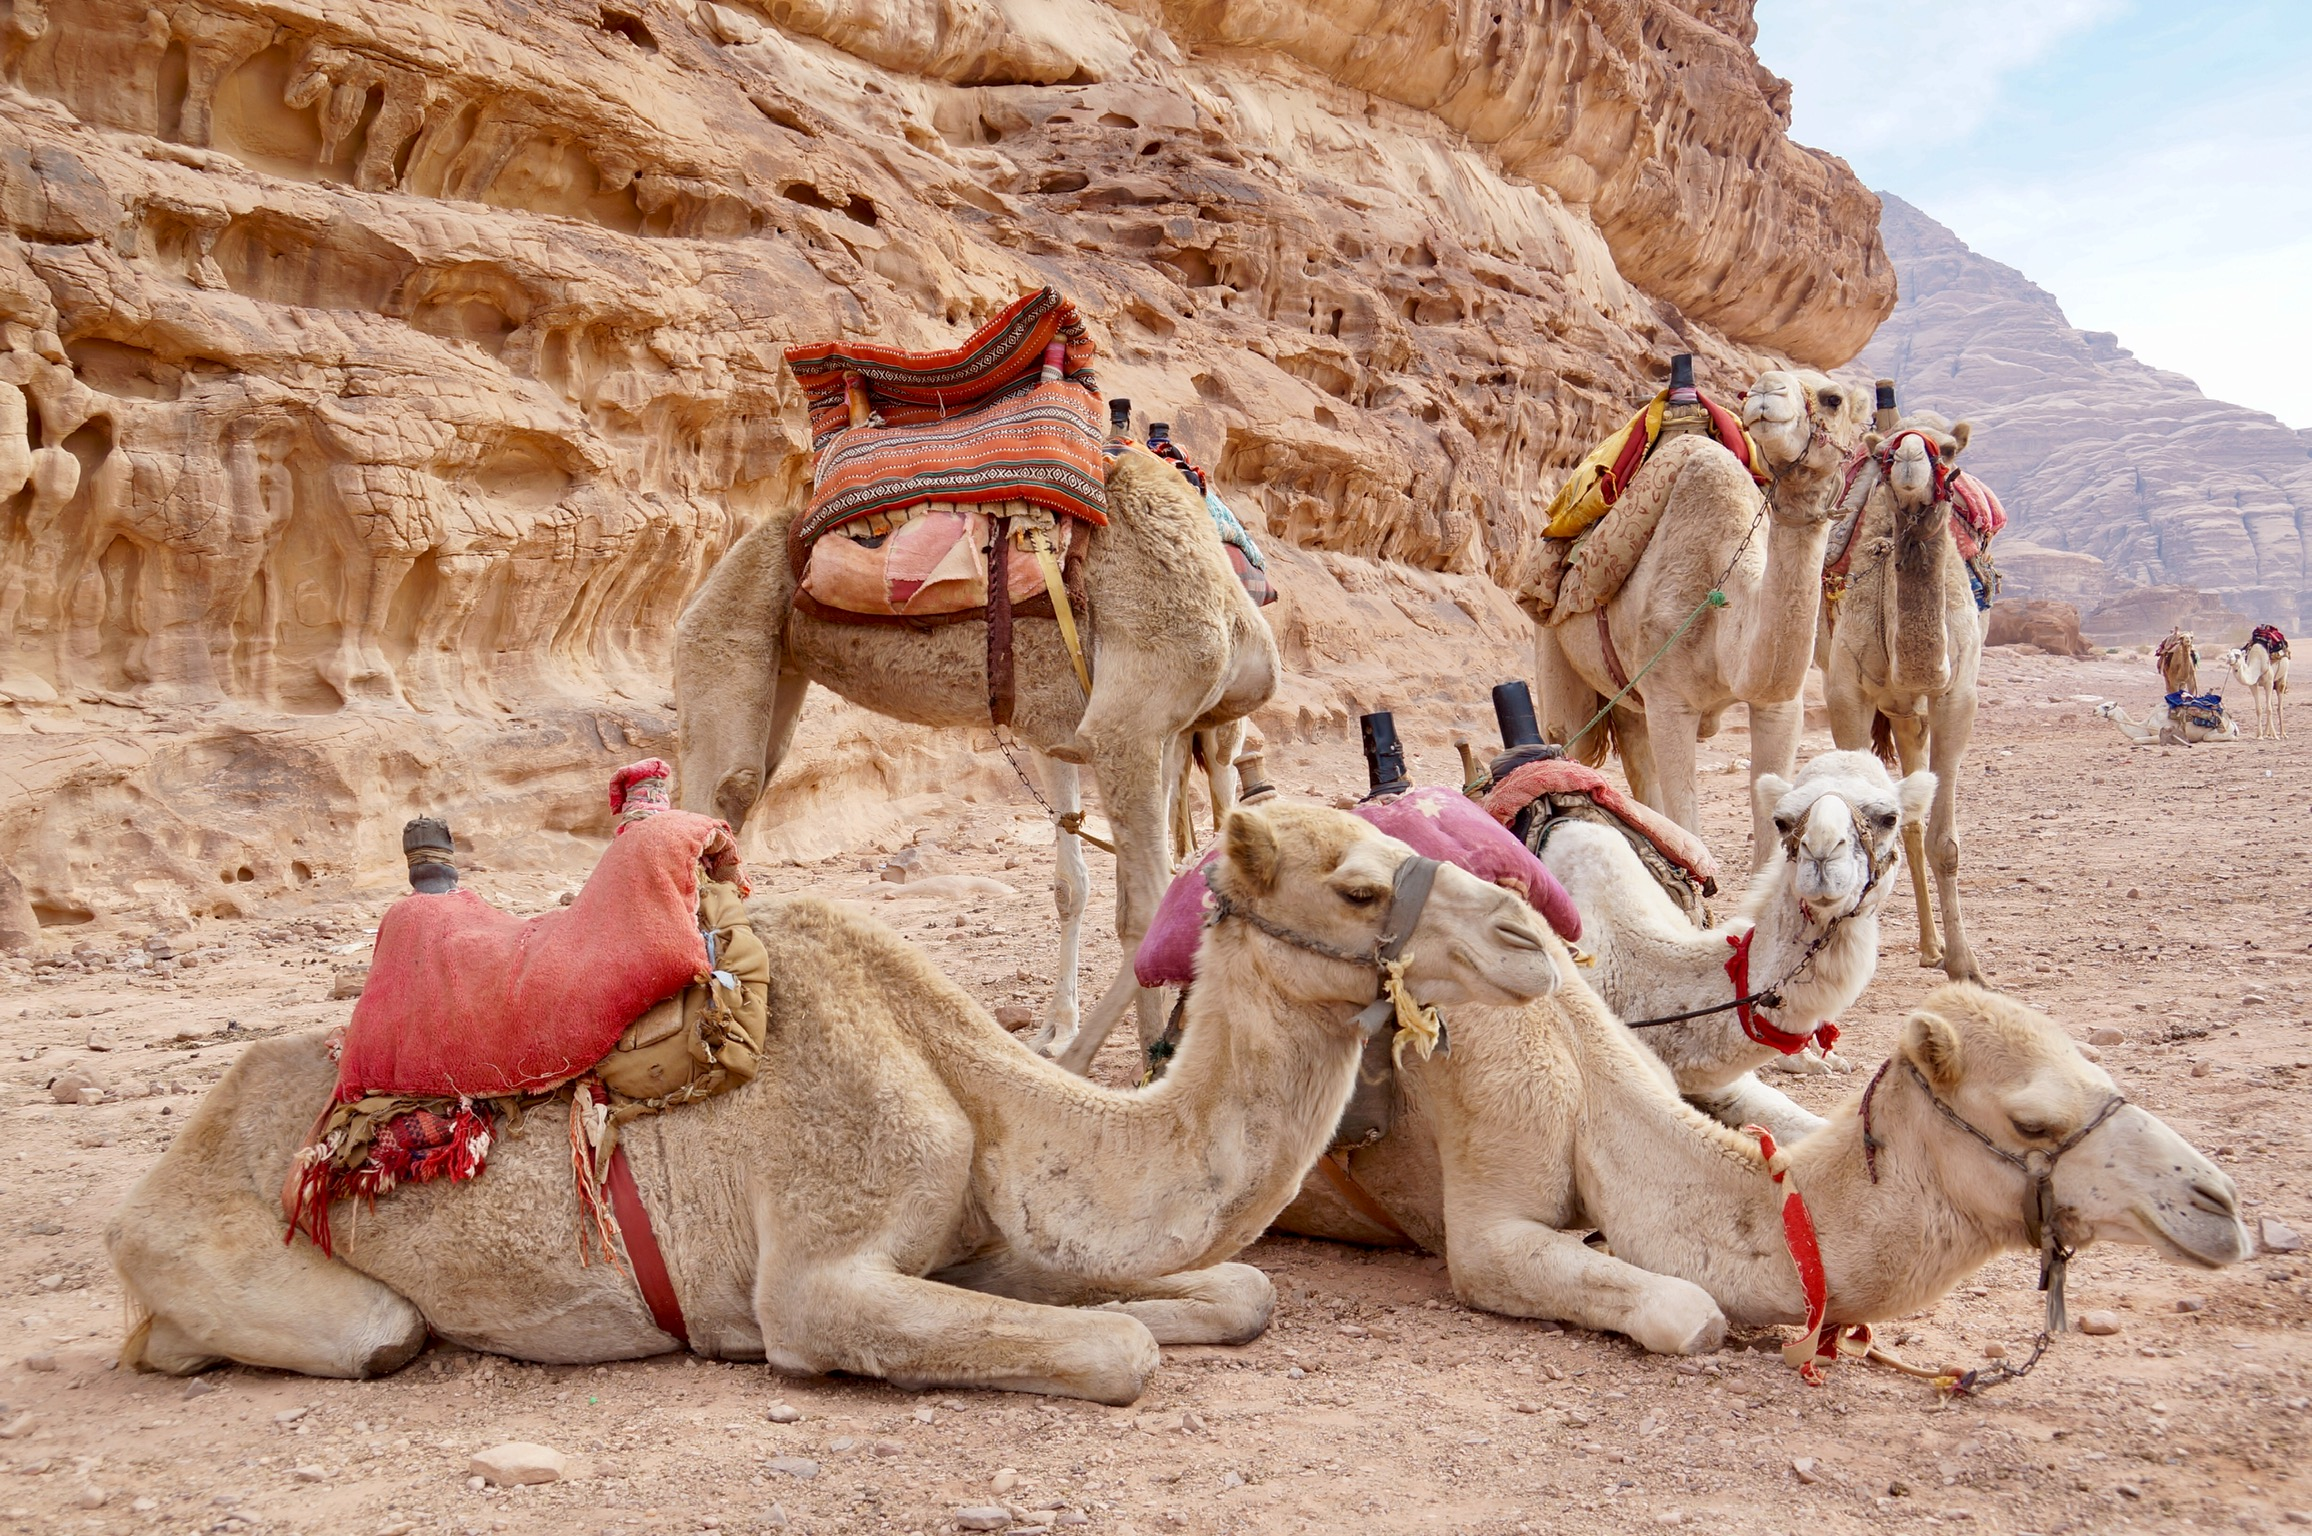 Lawrence of Arabia in Wadi Rum